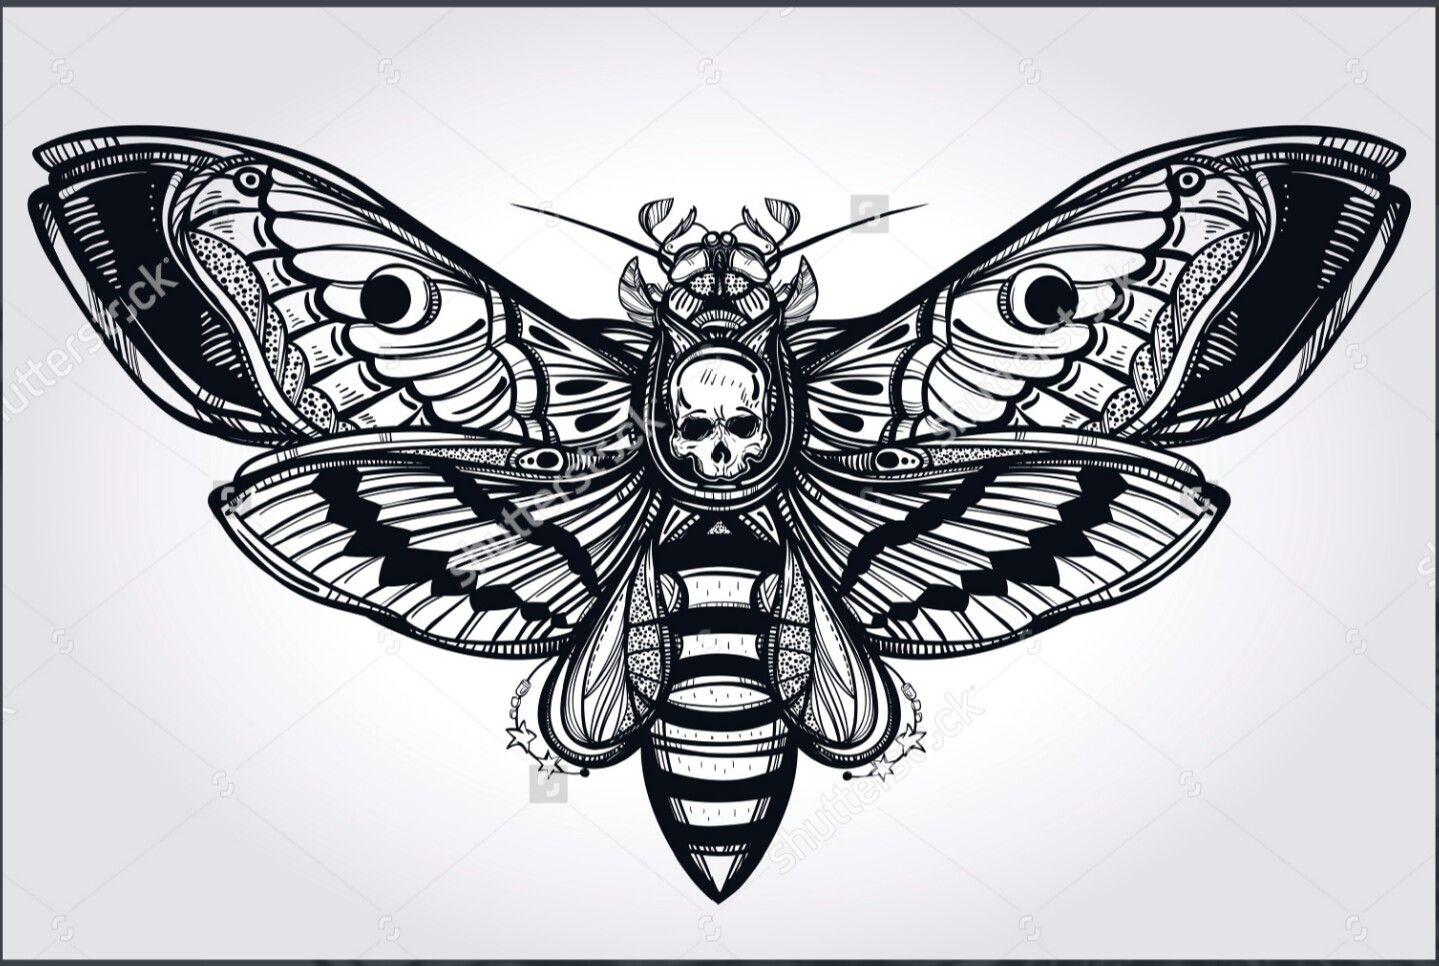 Death head moth wings disc golf designs pinterest for Disc golf tattoos